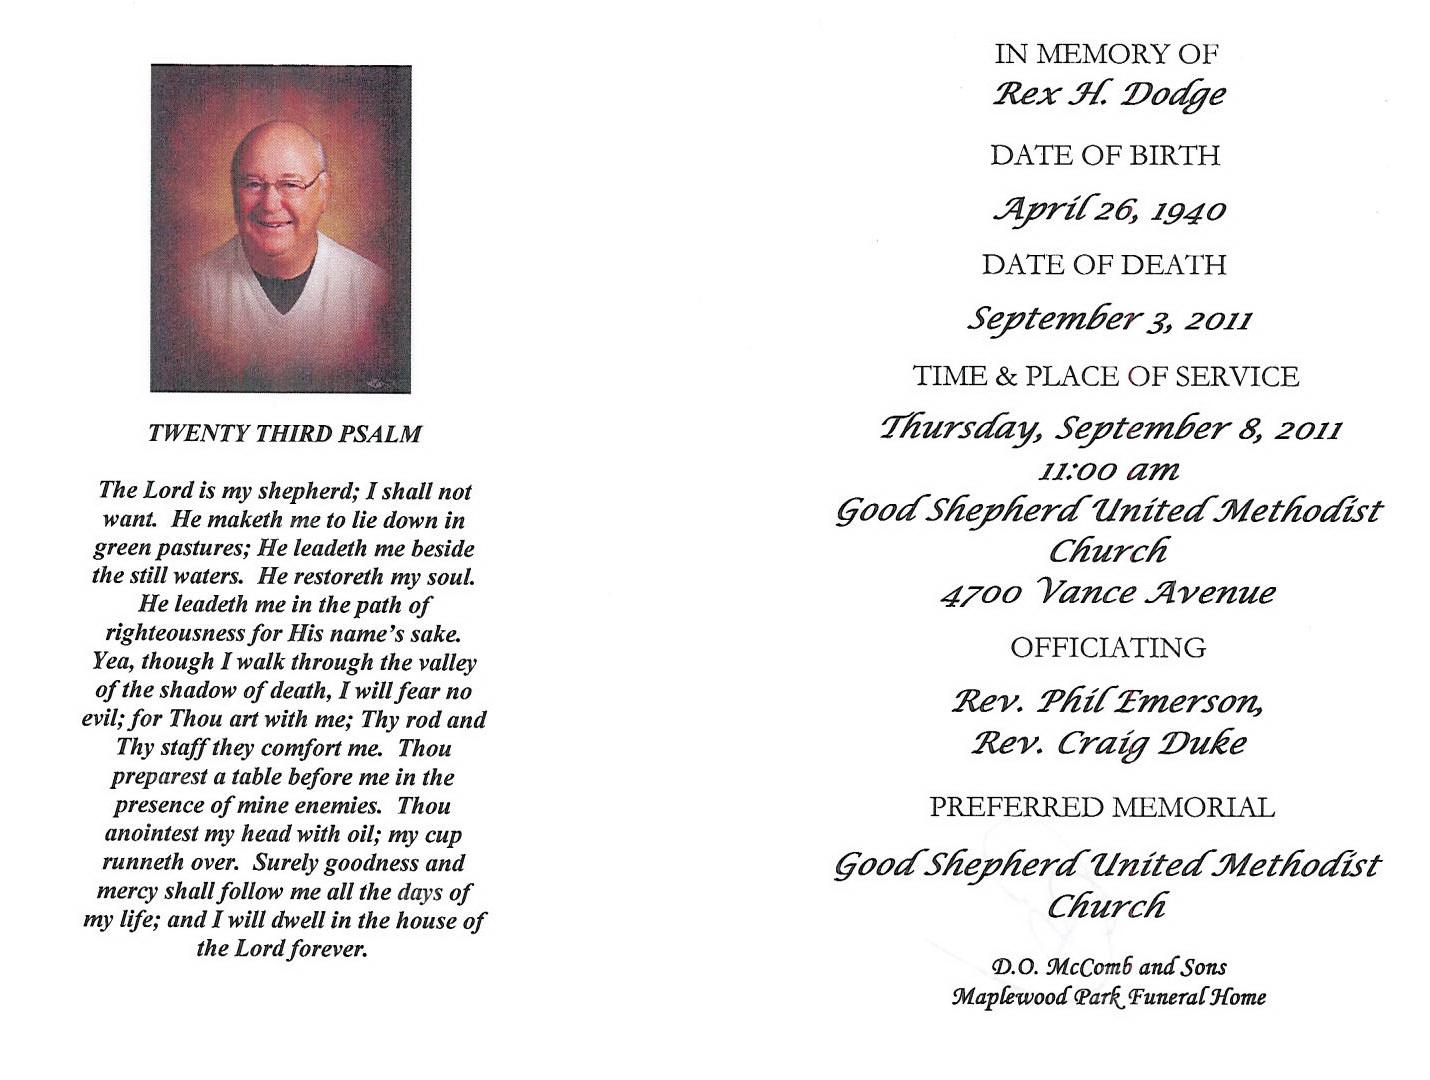 Good shepherd funeral home rome ga - Craig Duke Good Shepherd U M C